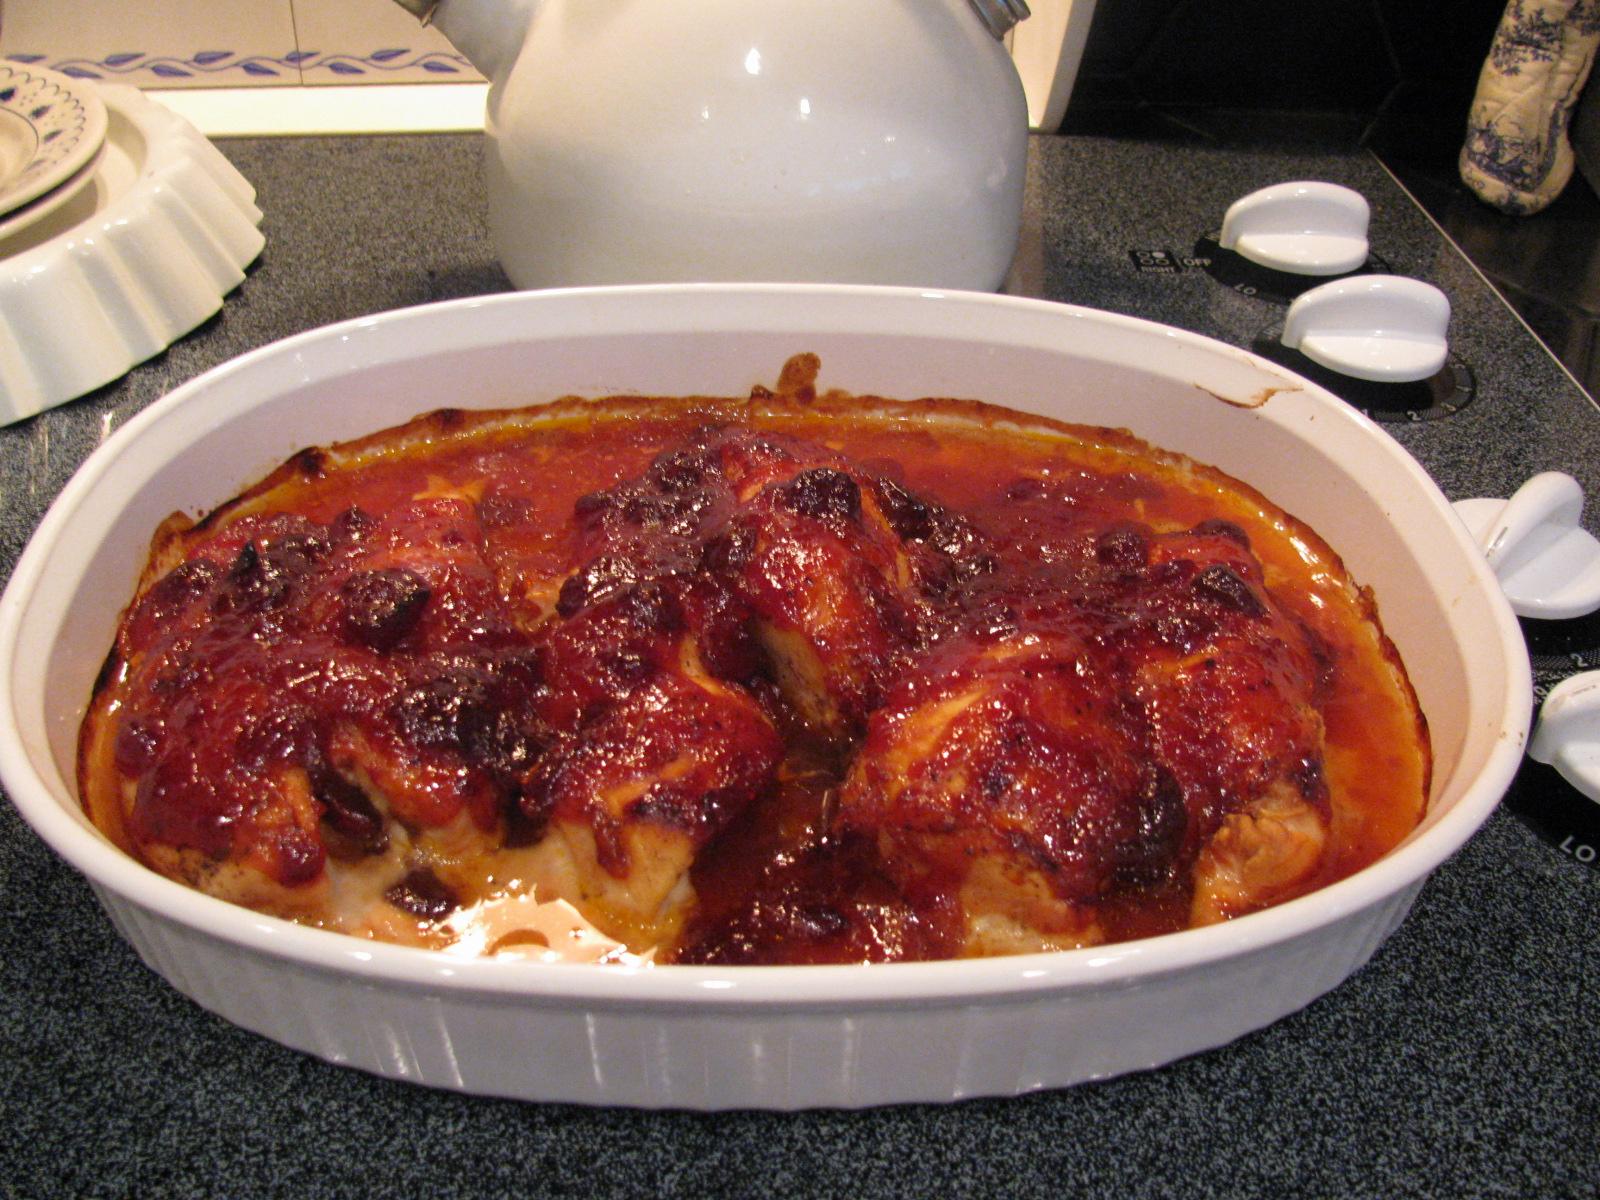 Recipe for cranberry glazed chicken